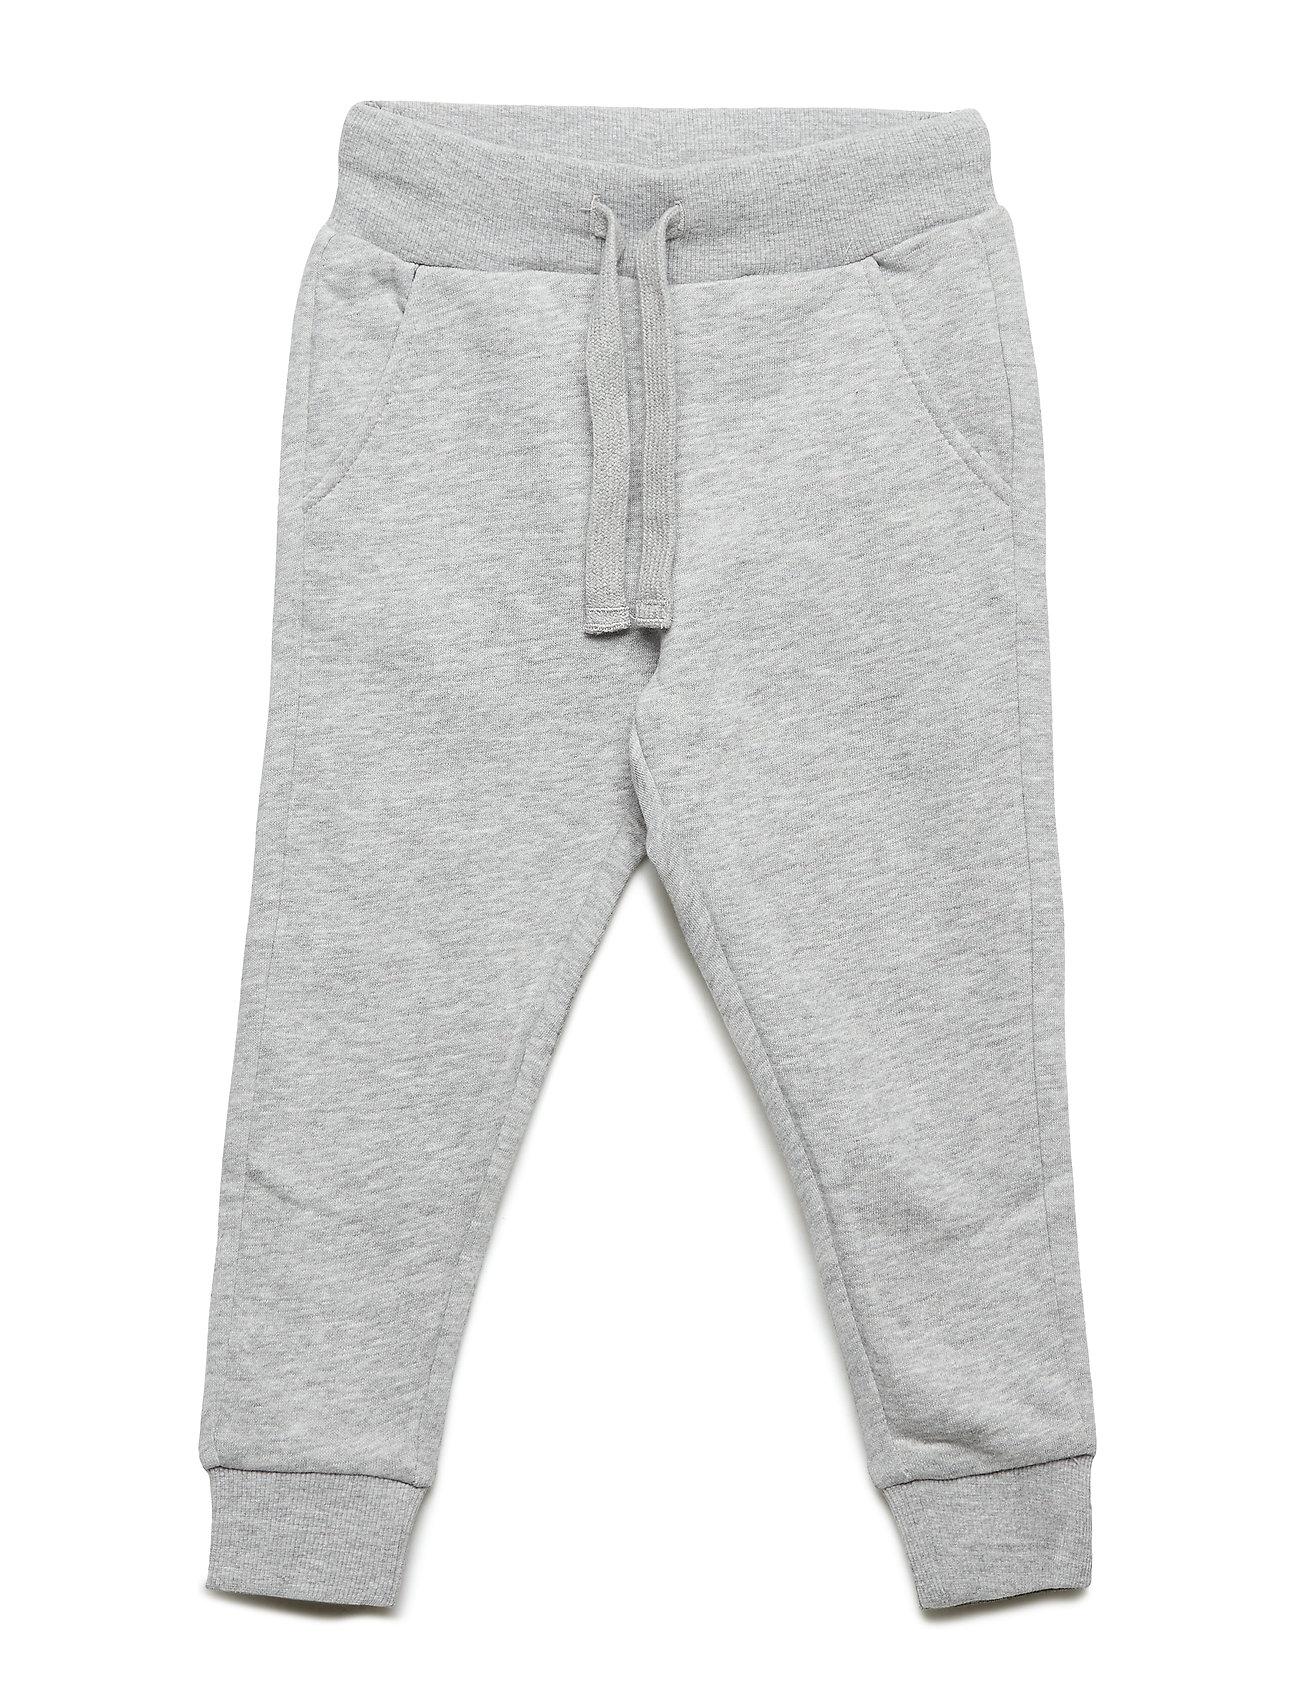 Lindex Sweatpants - GREY MELANGE